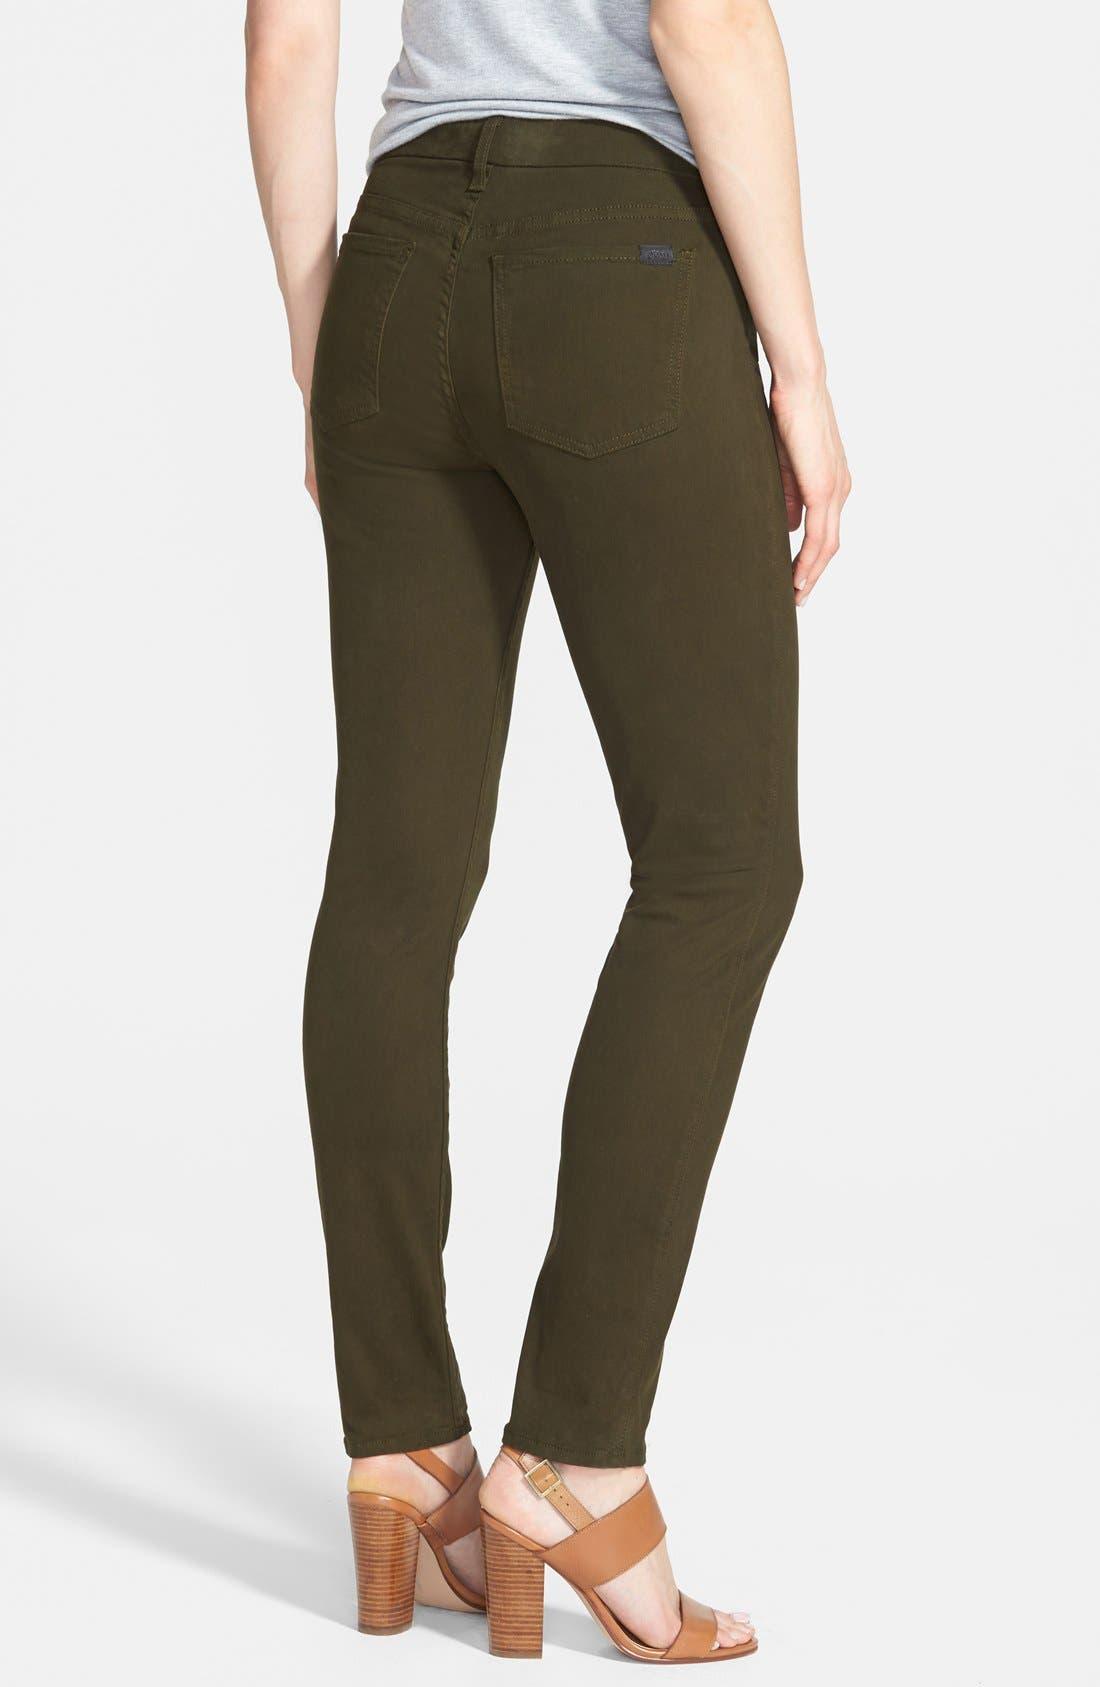 Colored Stretch Denim Skinny Jeans,                             Alternate thumbnail 2, color,                             Olive